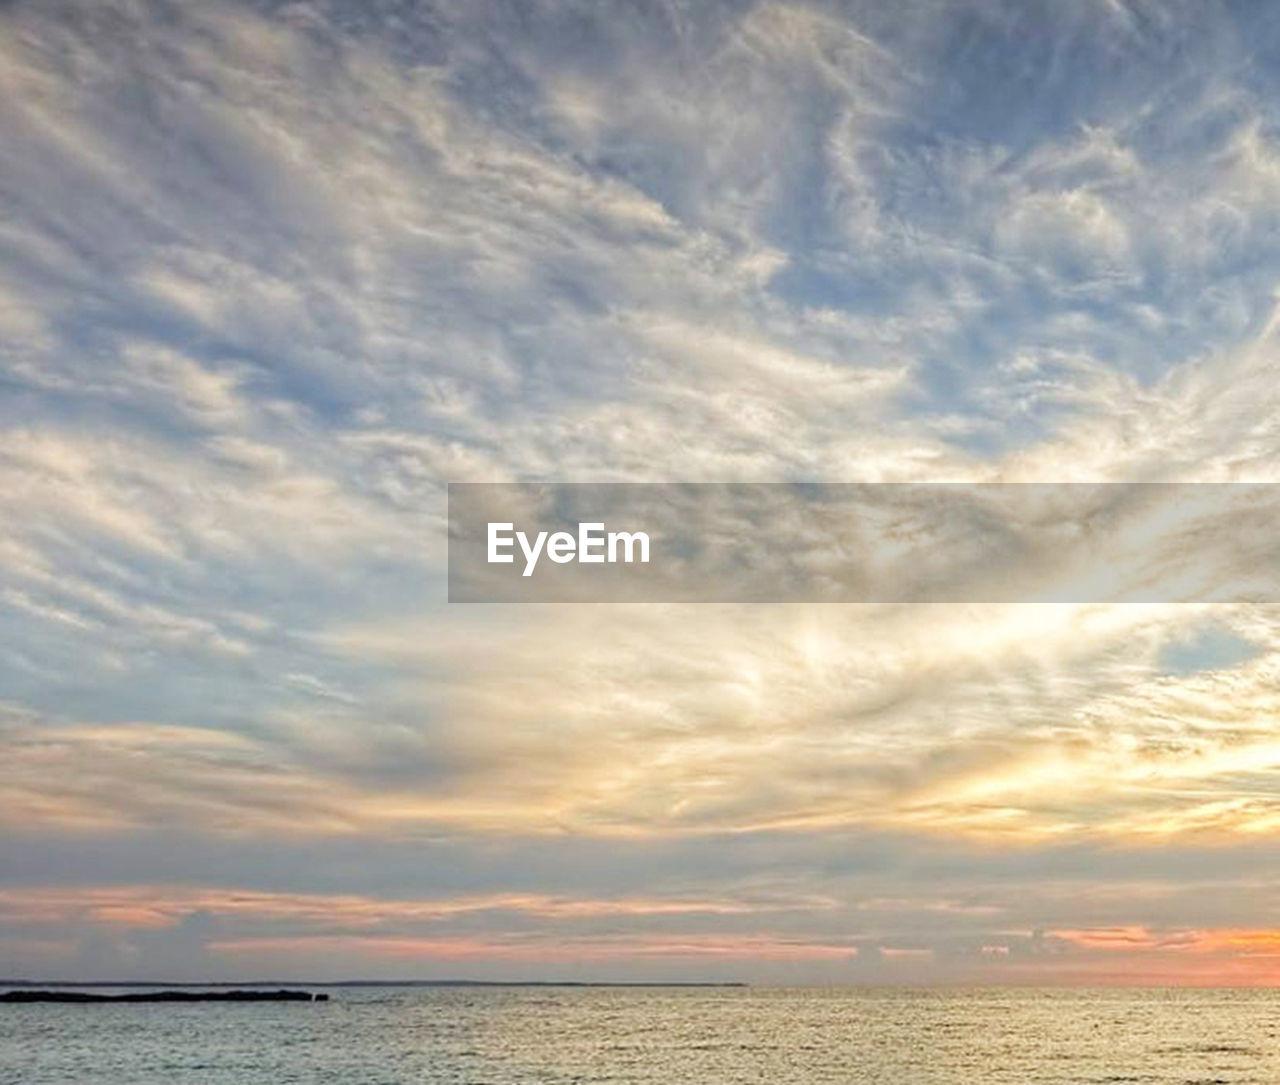 sky, cloud - sky, sea, water, beauty in nature, scenics - nature, horizon, horizon over water, tranquility, tranquil scene, sunset, nature, no people, idyllic, outdoors, waterfront, dramatic sky, non-urban scene, beach